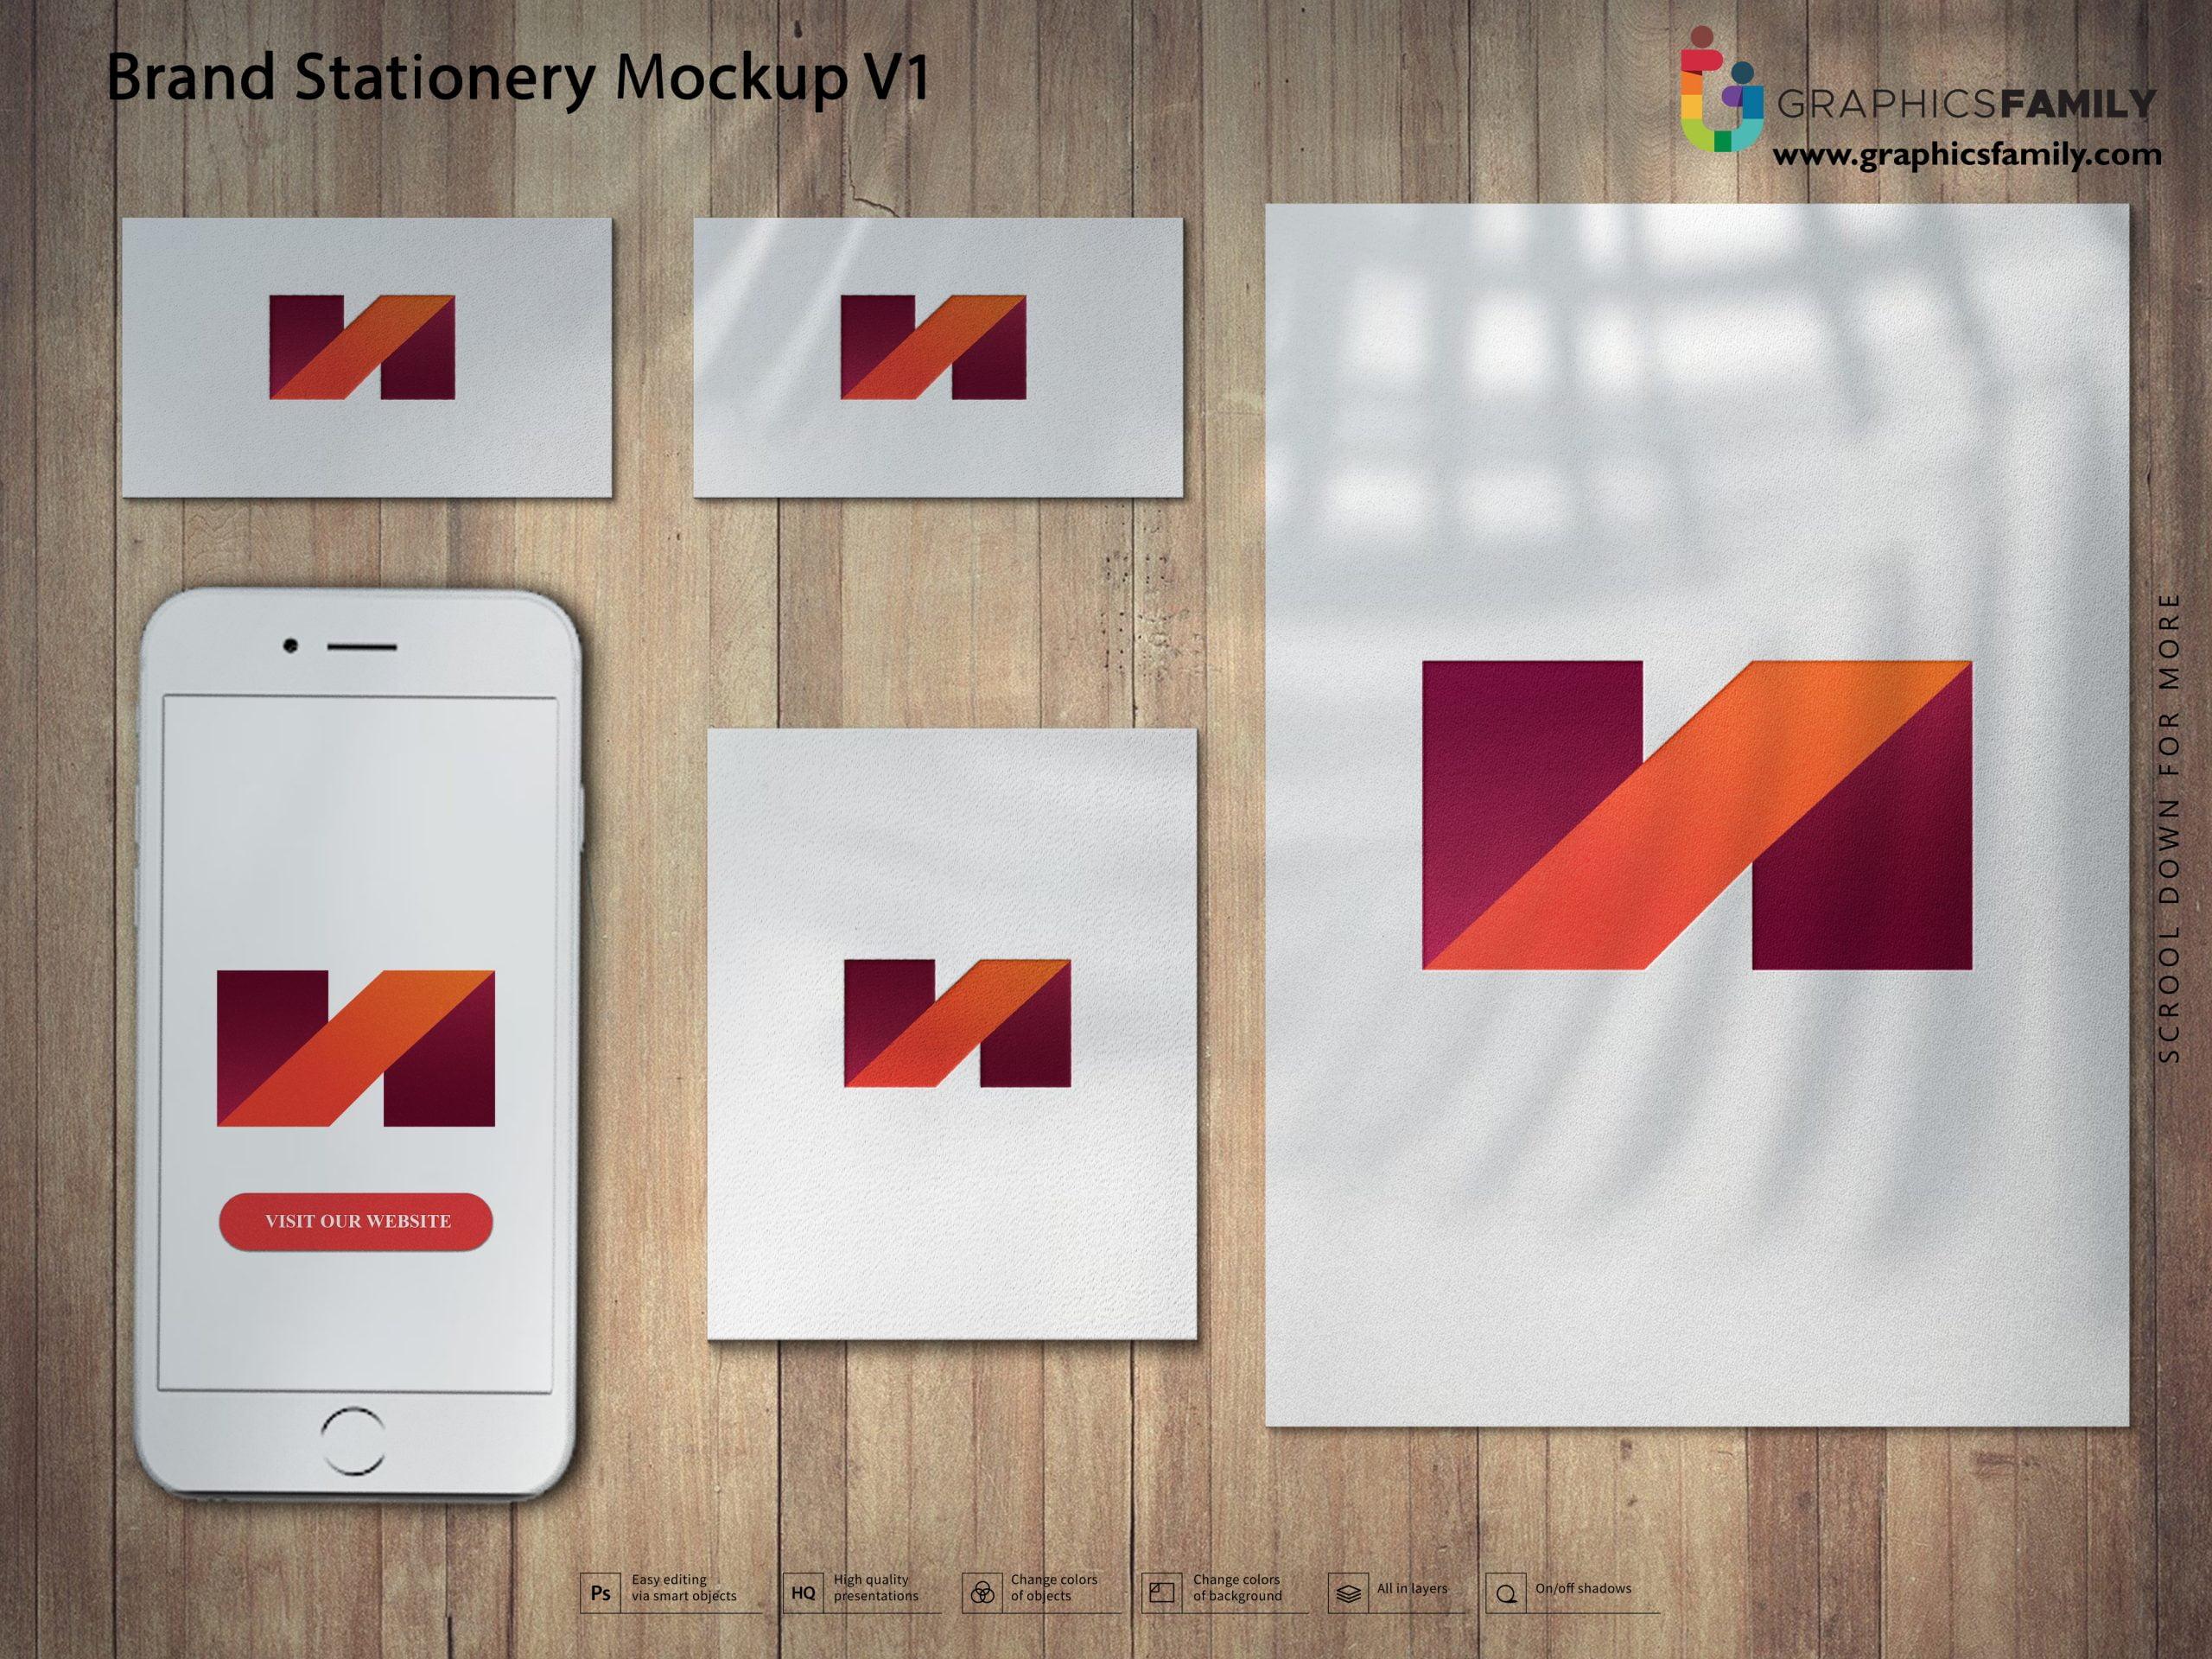 Best Free Brand Stationery Mockup PSD Download